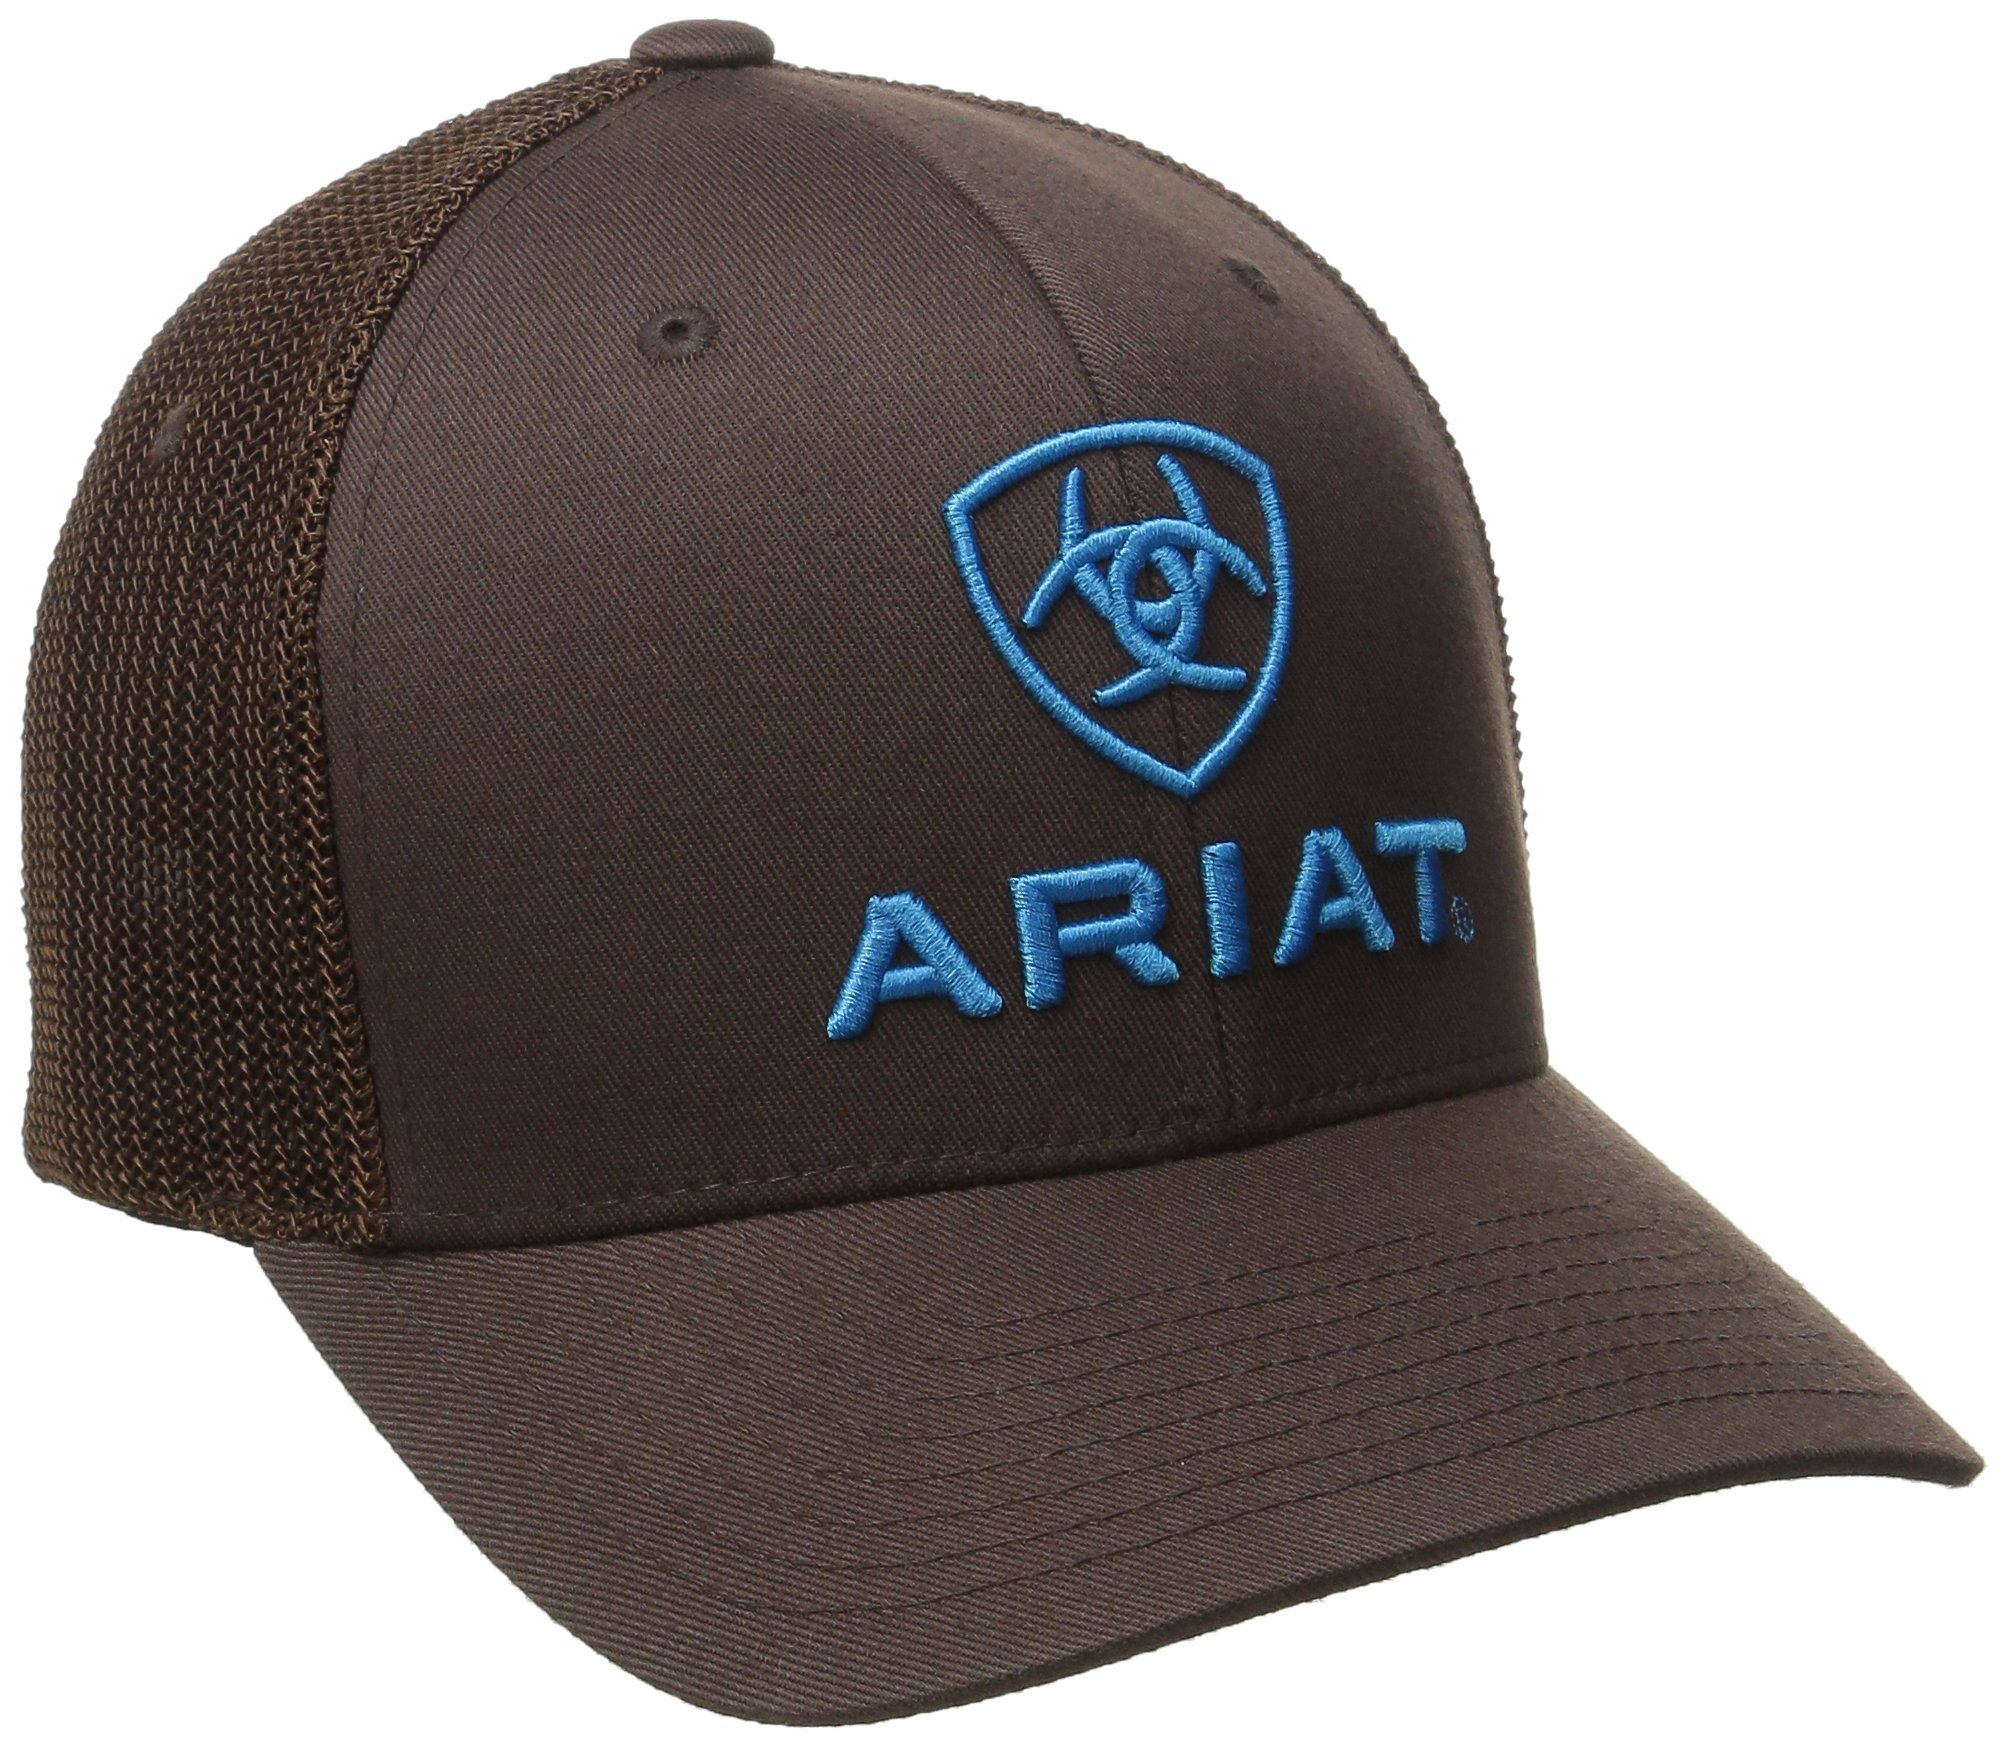 Ariat Men's Blue Half Mesh Hat, Brown, Small/Medium